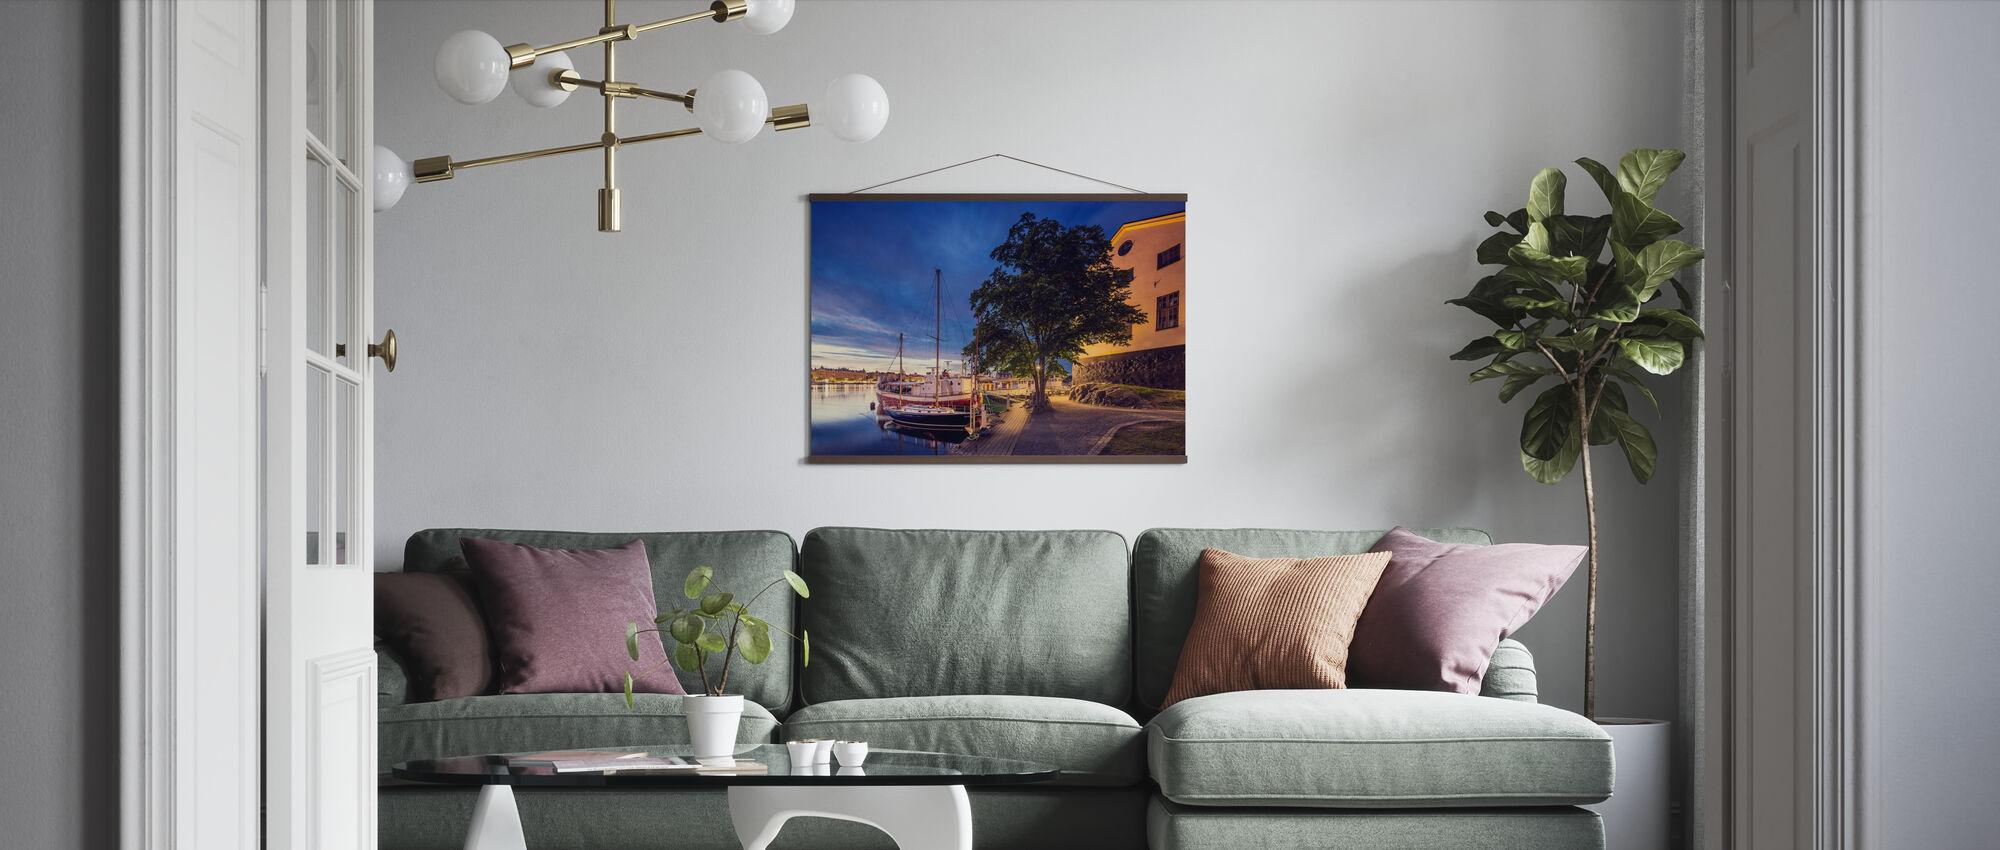 Båtar på Dusk, Stockholm - Poster - Vardagsrum